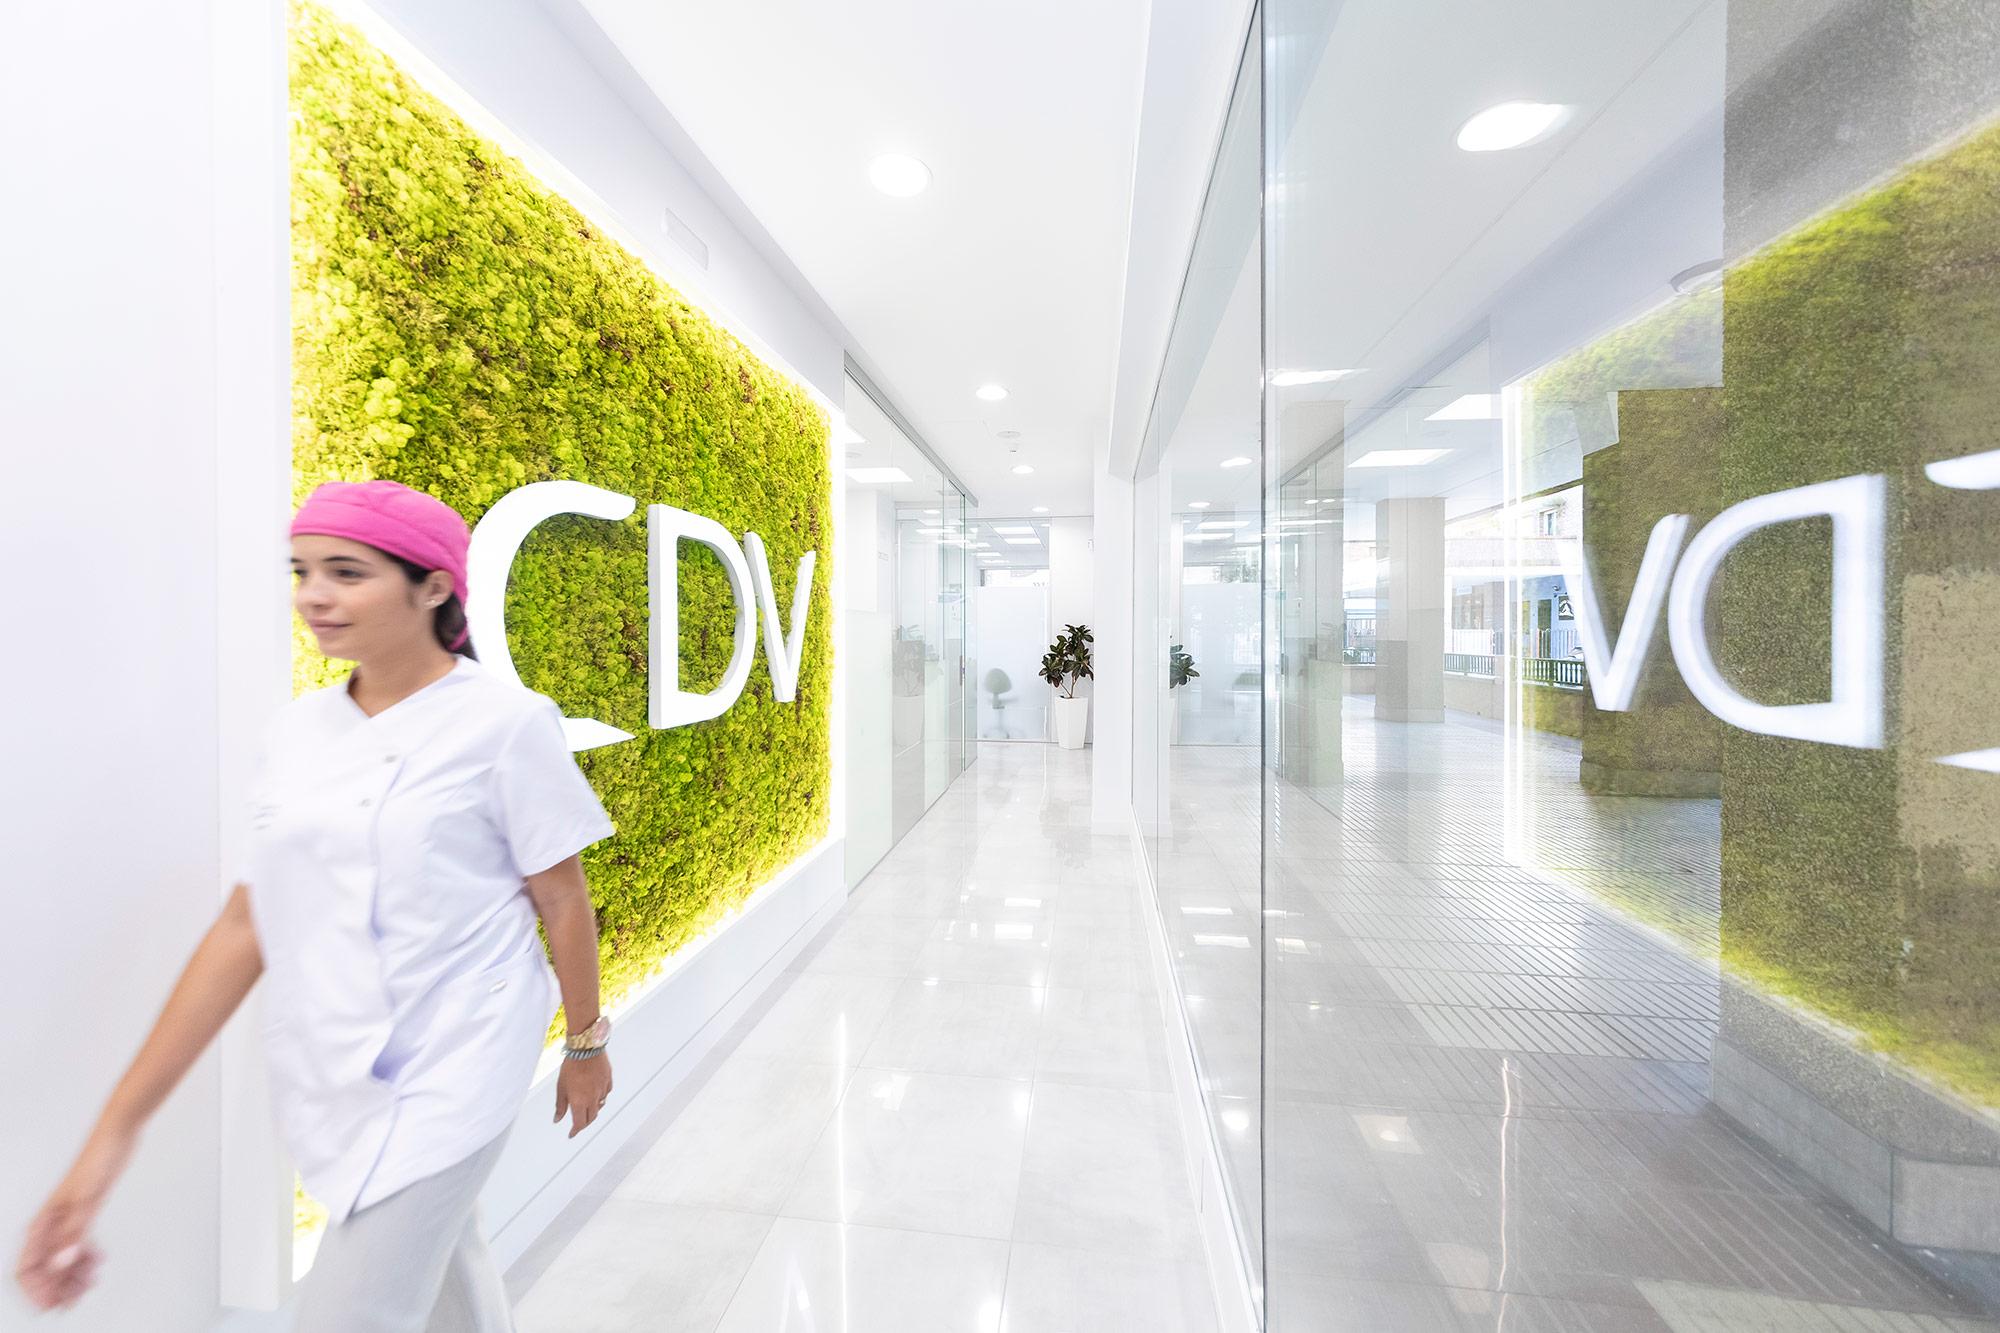 Pasillo de la Clínica Dental Villava